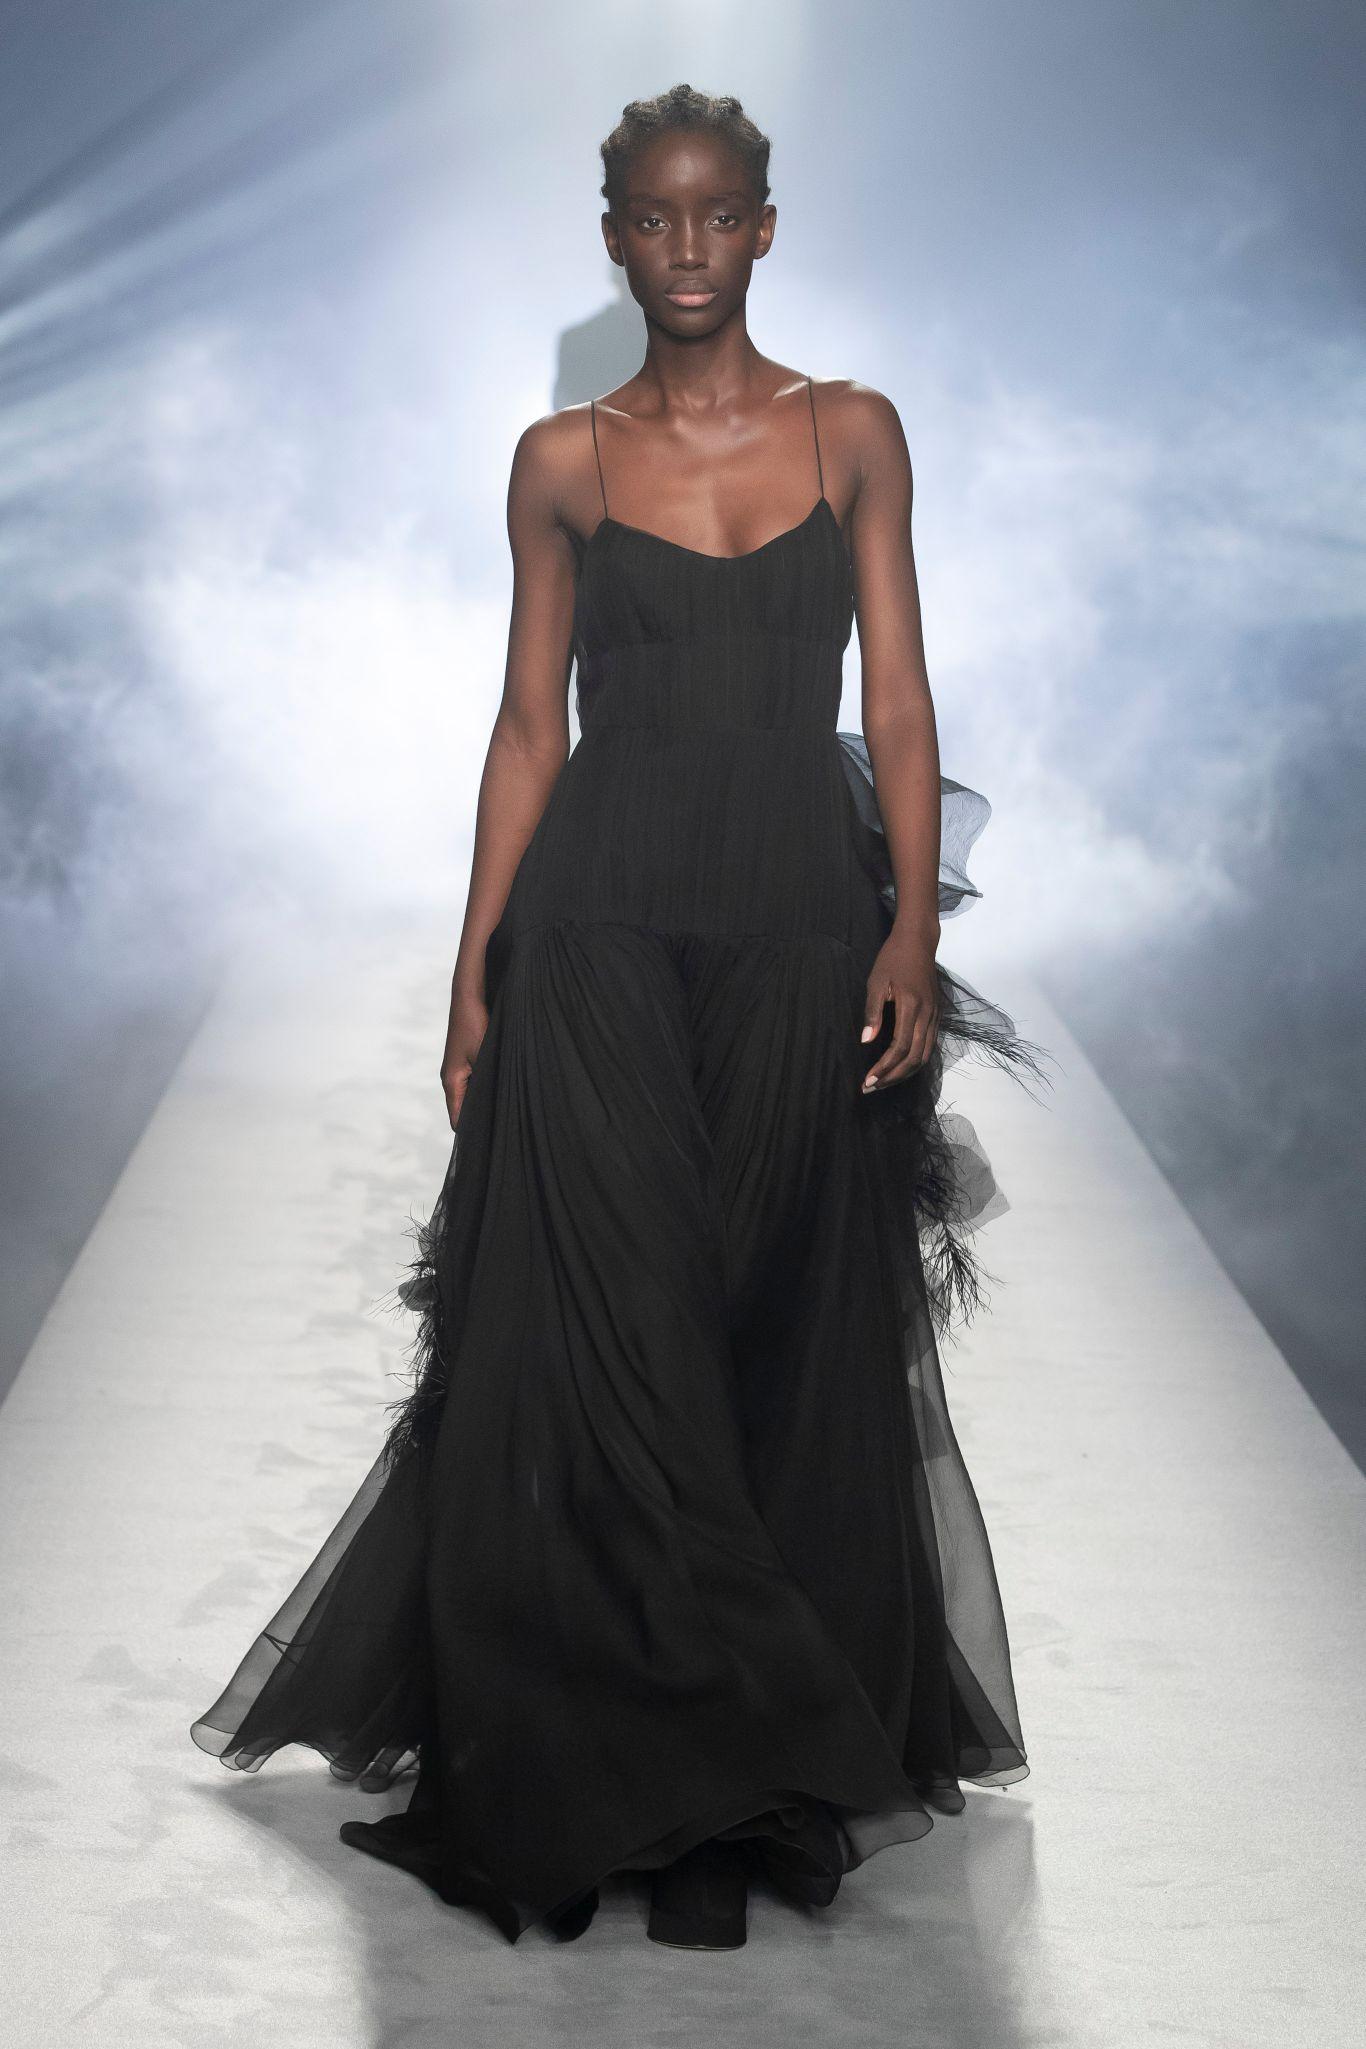 milan-fashion-week--alberta-ferretti-autumn-winter-2022-collection-milan-fashion-week--alberta-ferretti-autumn-winter-2022-collection_(8).jpg